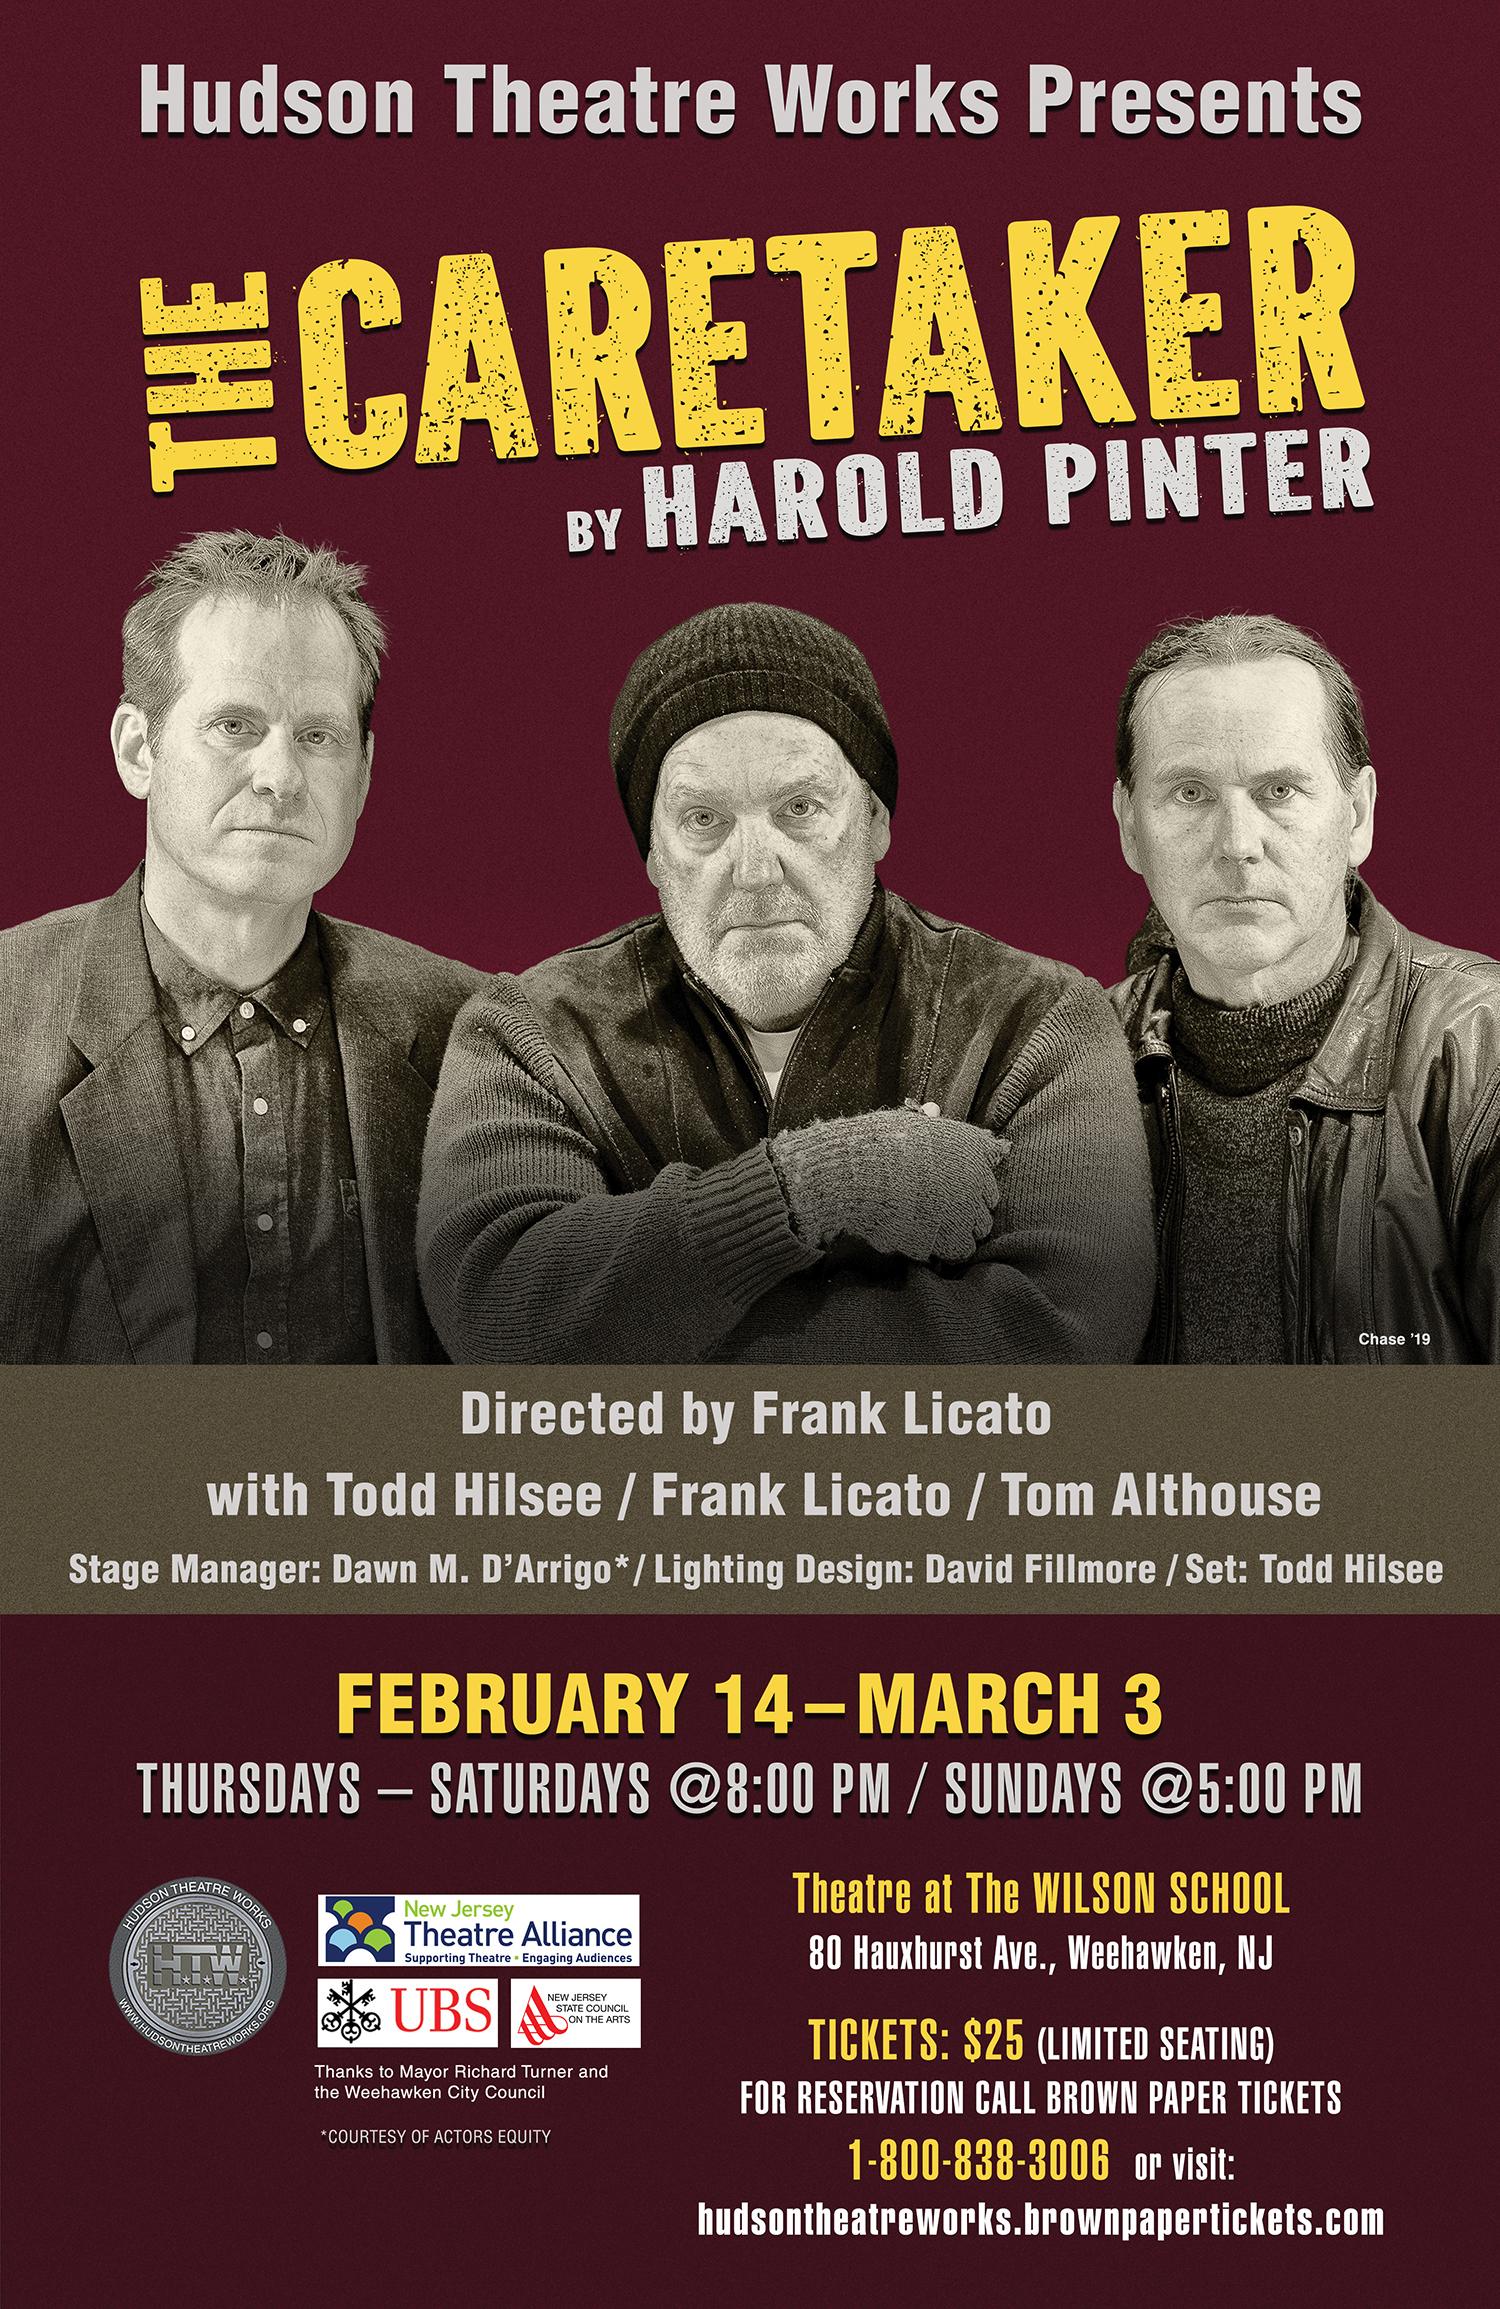 Hudson Theatre Works Present Harold Pinter's THE CARETAKER